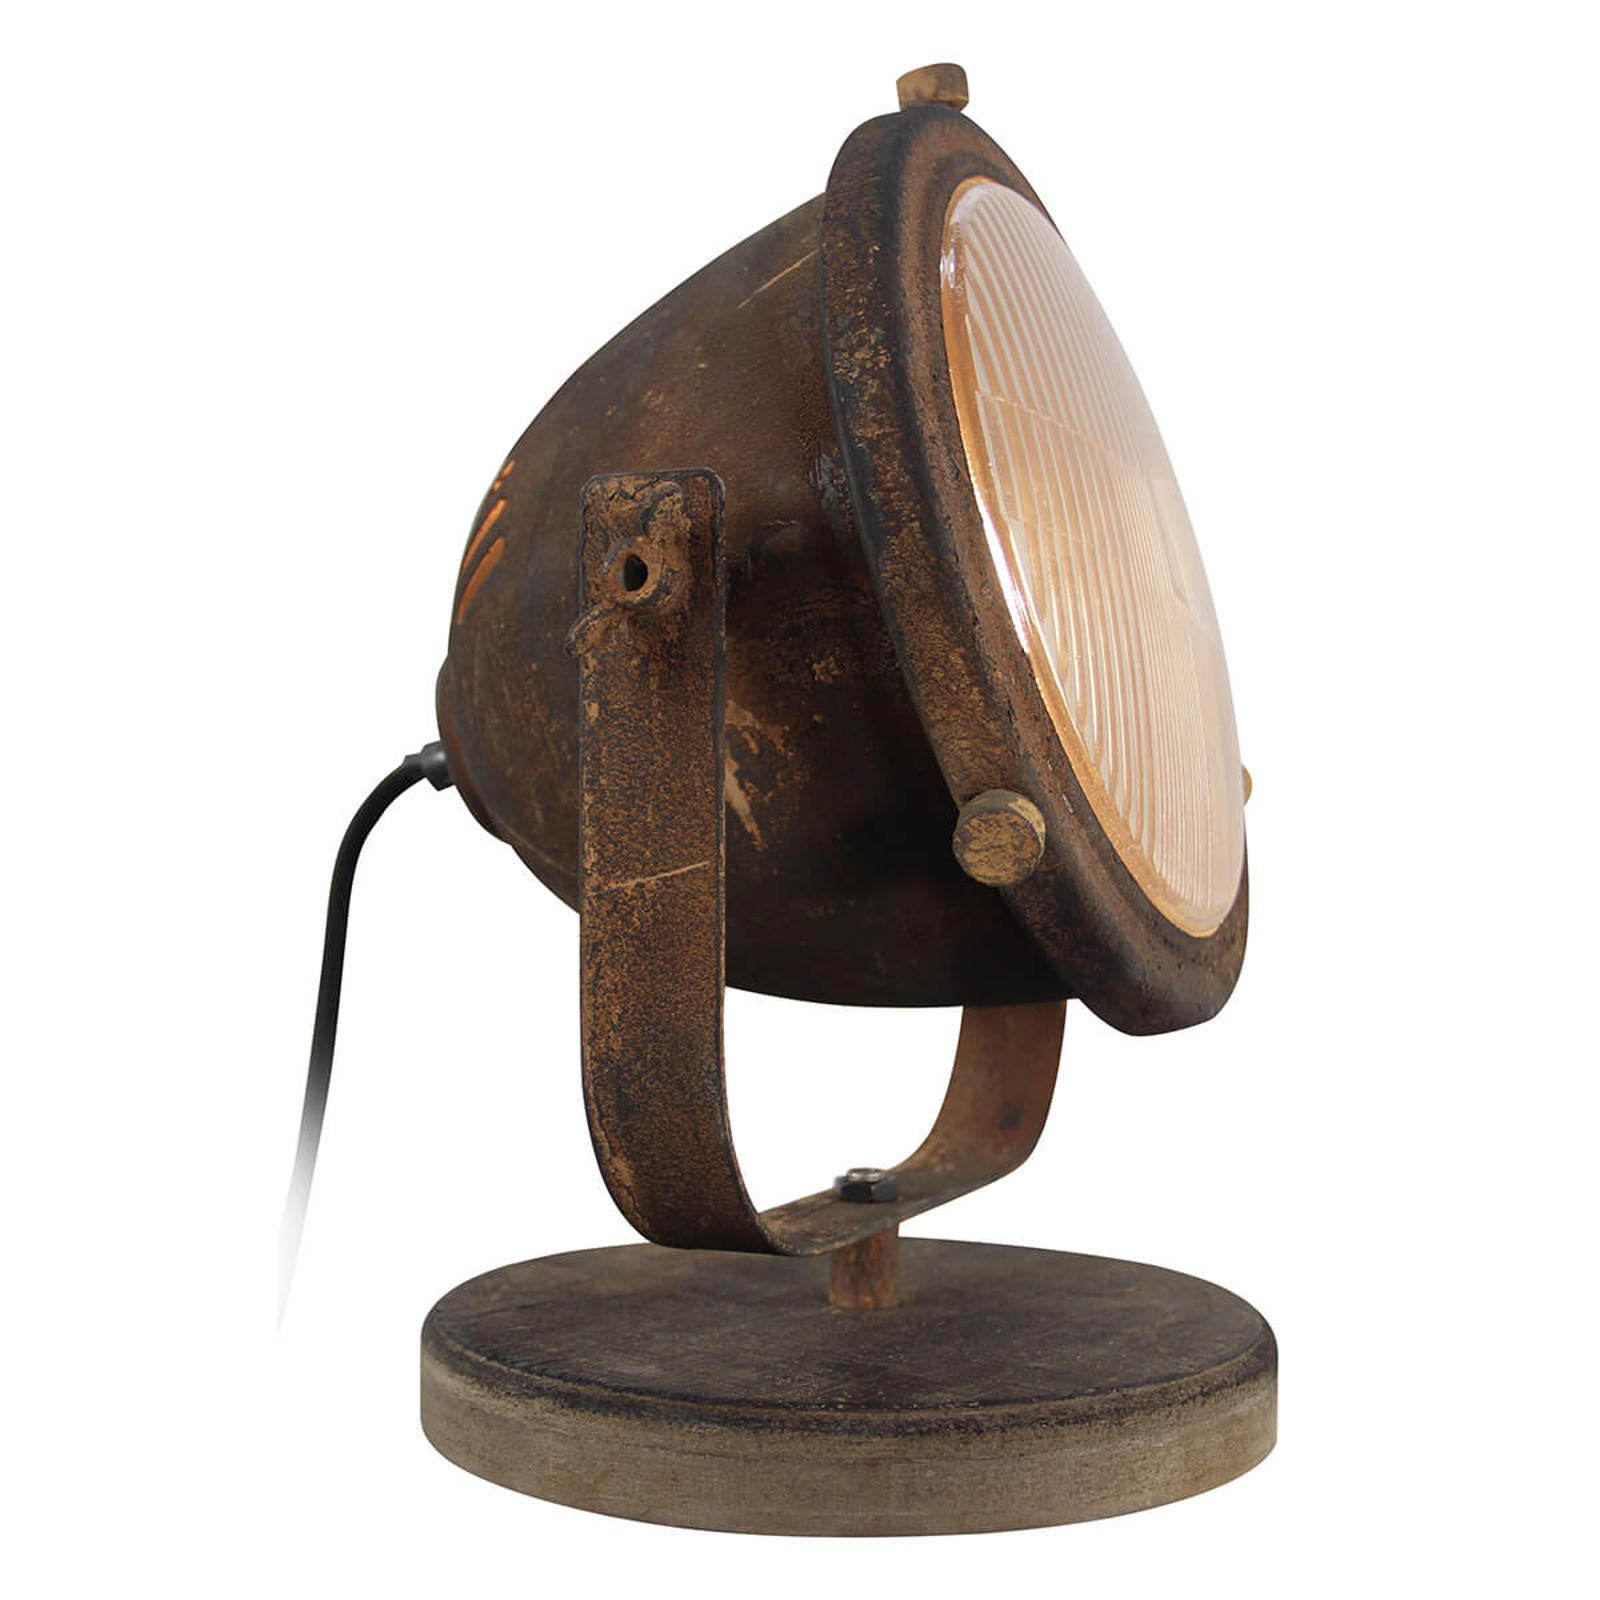 Tafellamp Carmen industriestijl, roestkleurig